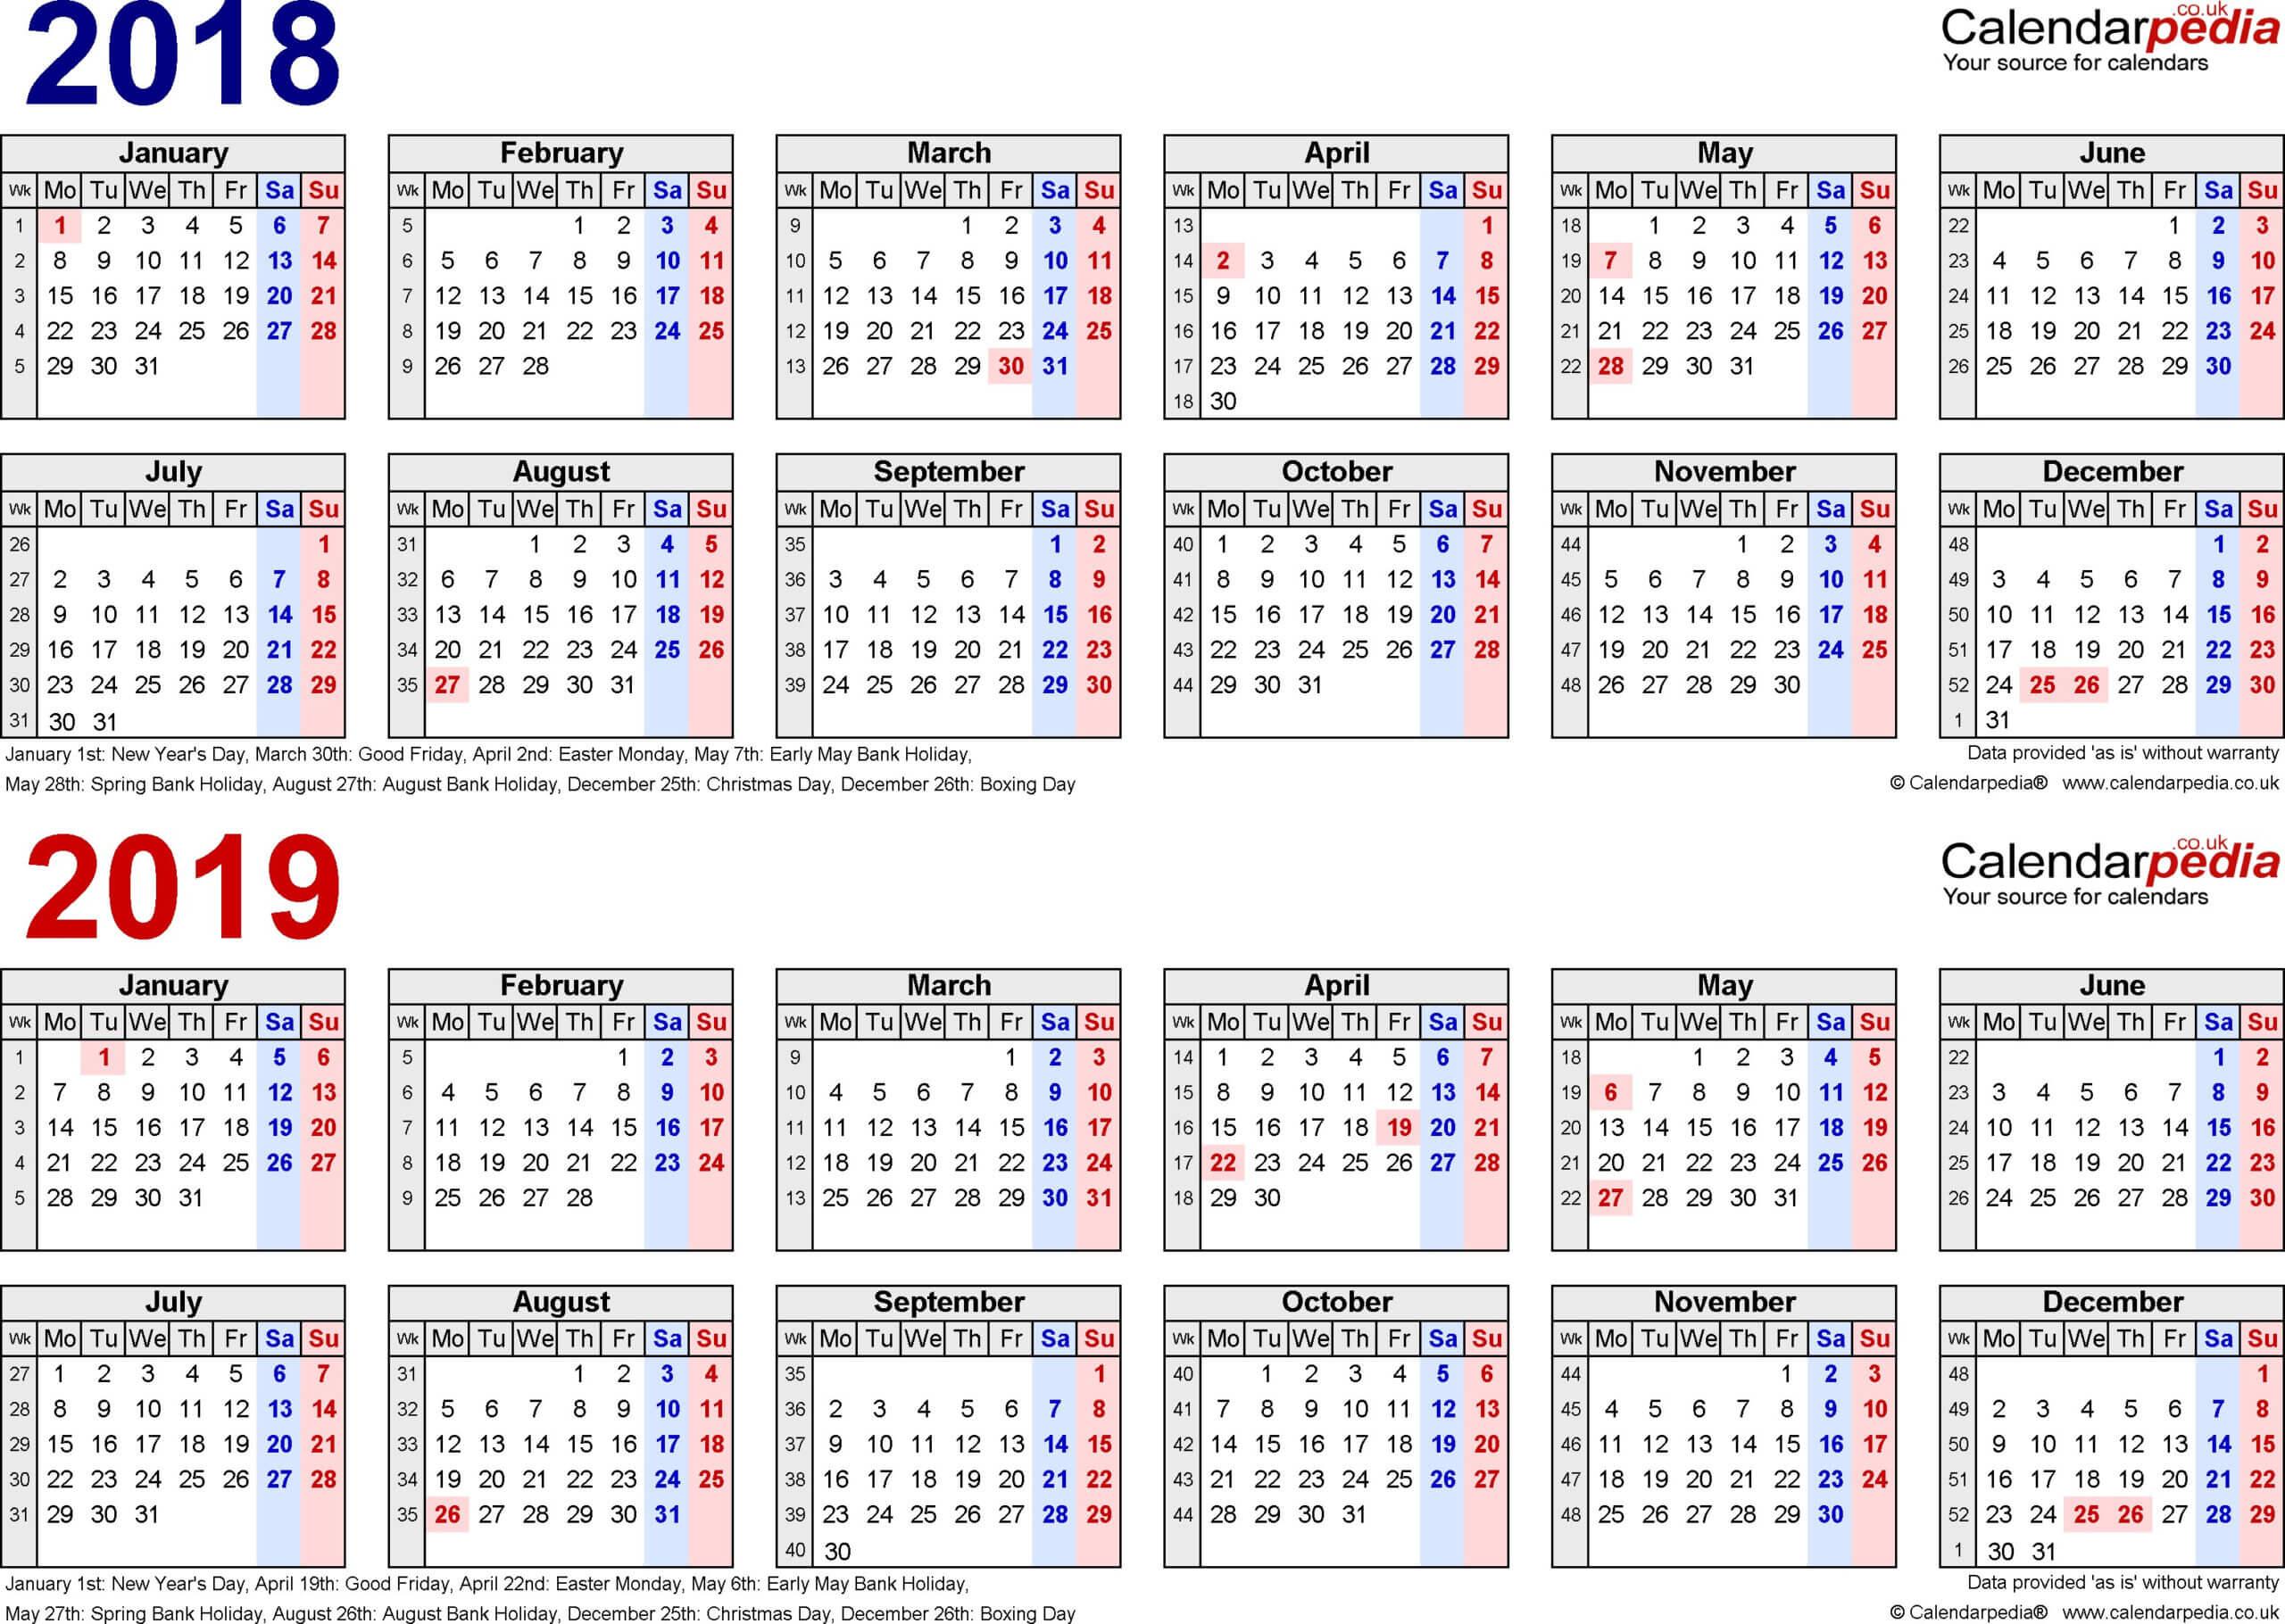 2017 Biweekly Payroll Calendar Template Elegant Elegant 2019 Intended For 2017 Biweekly Payroll Calendar Template